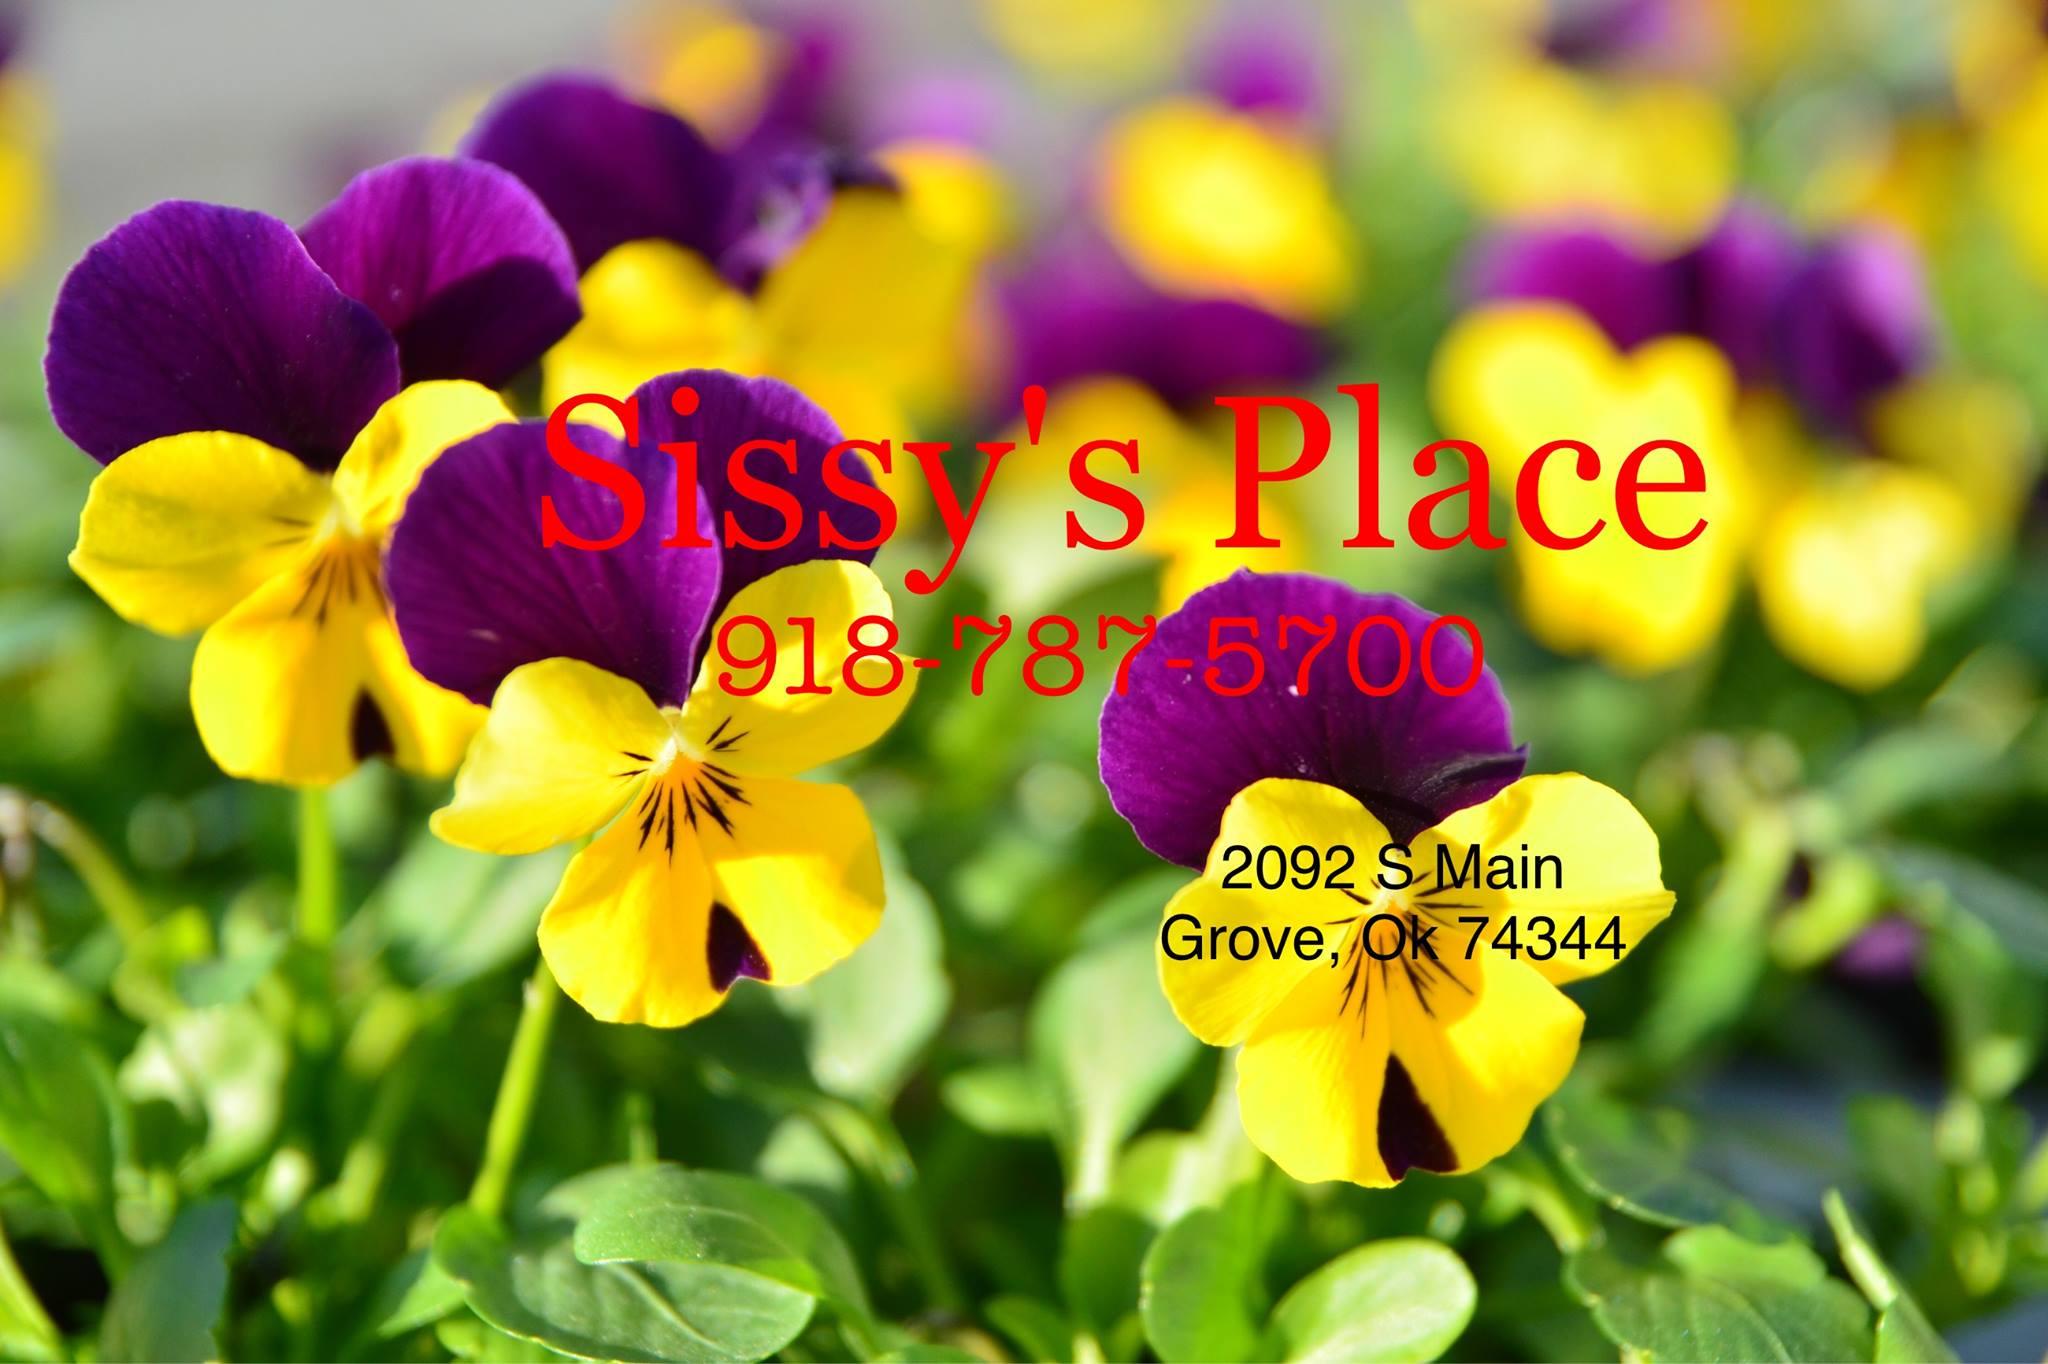 Sissy's Place, L.L.C.